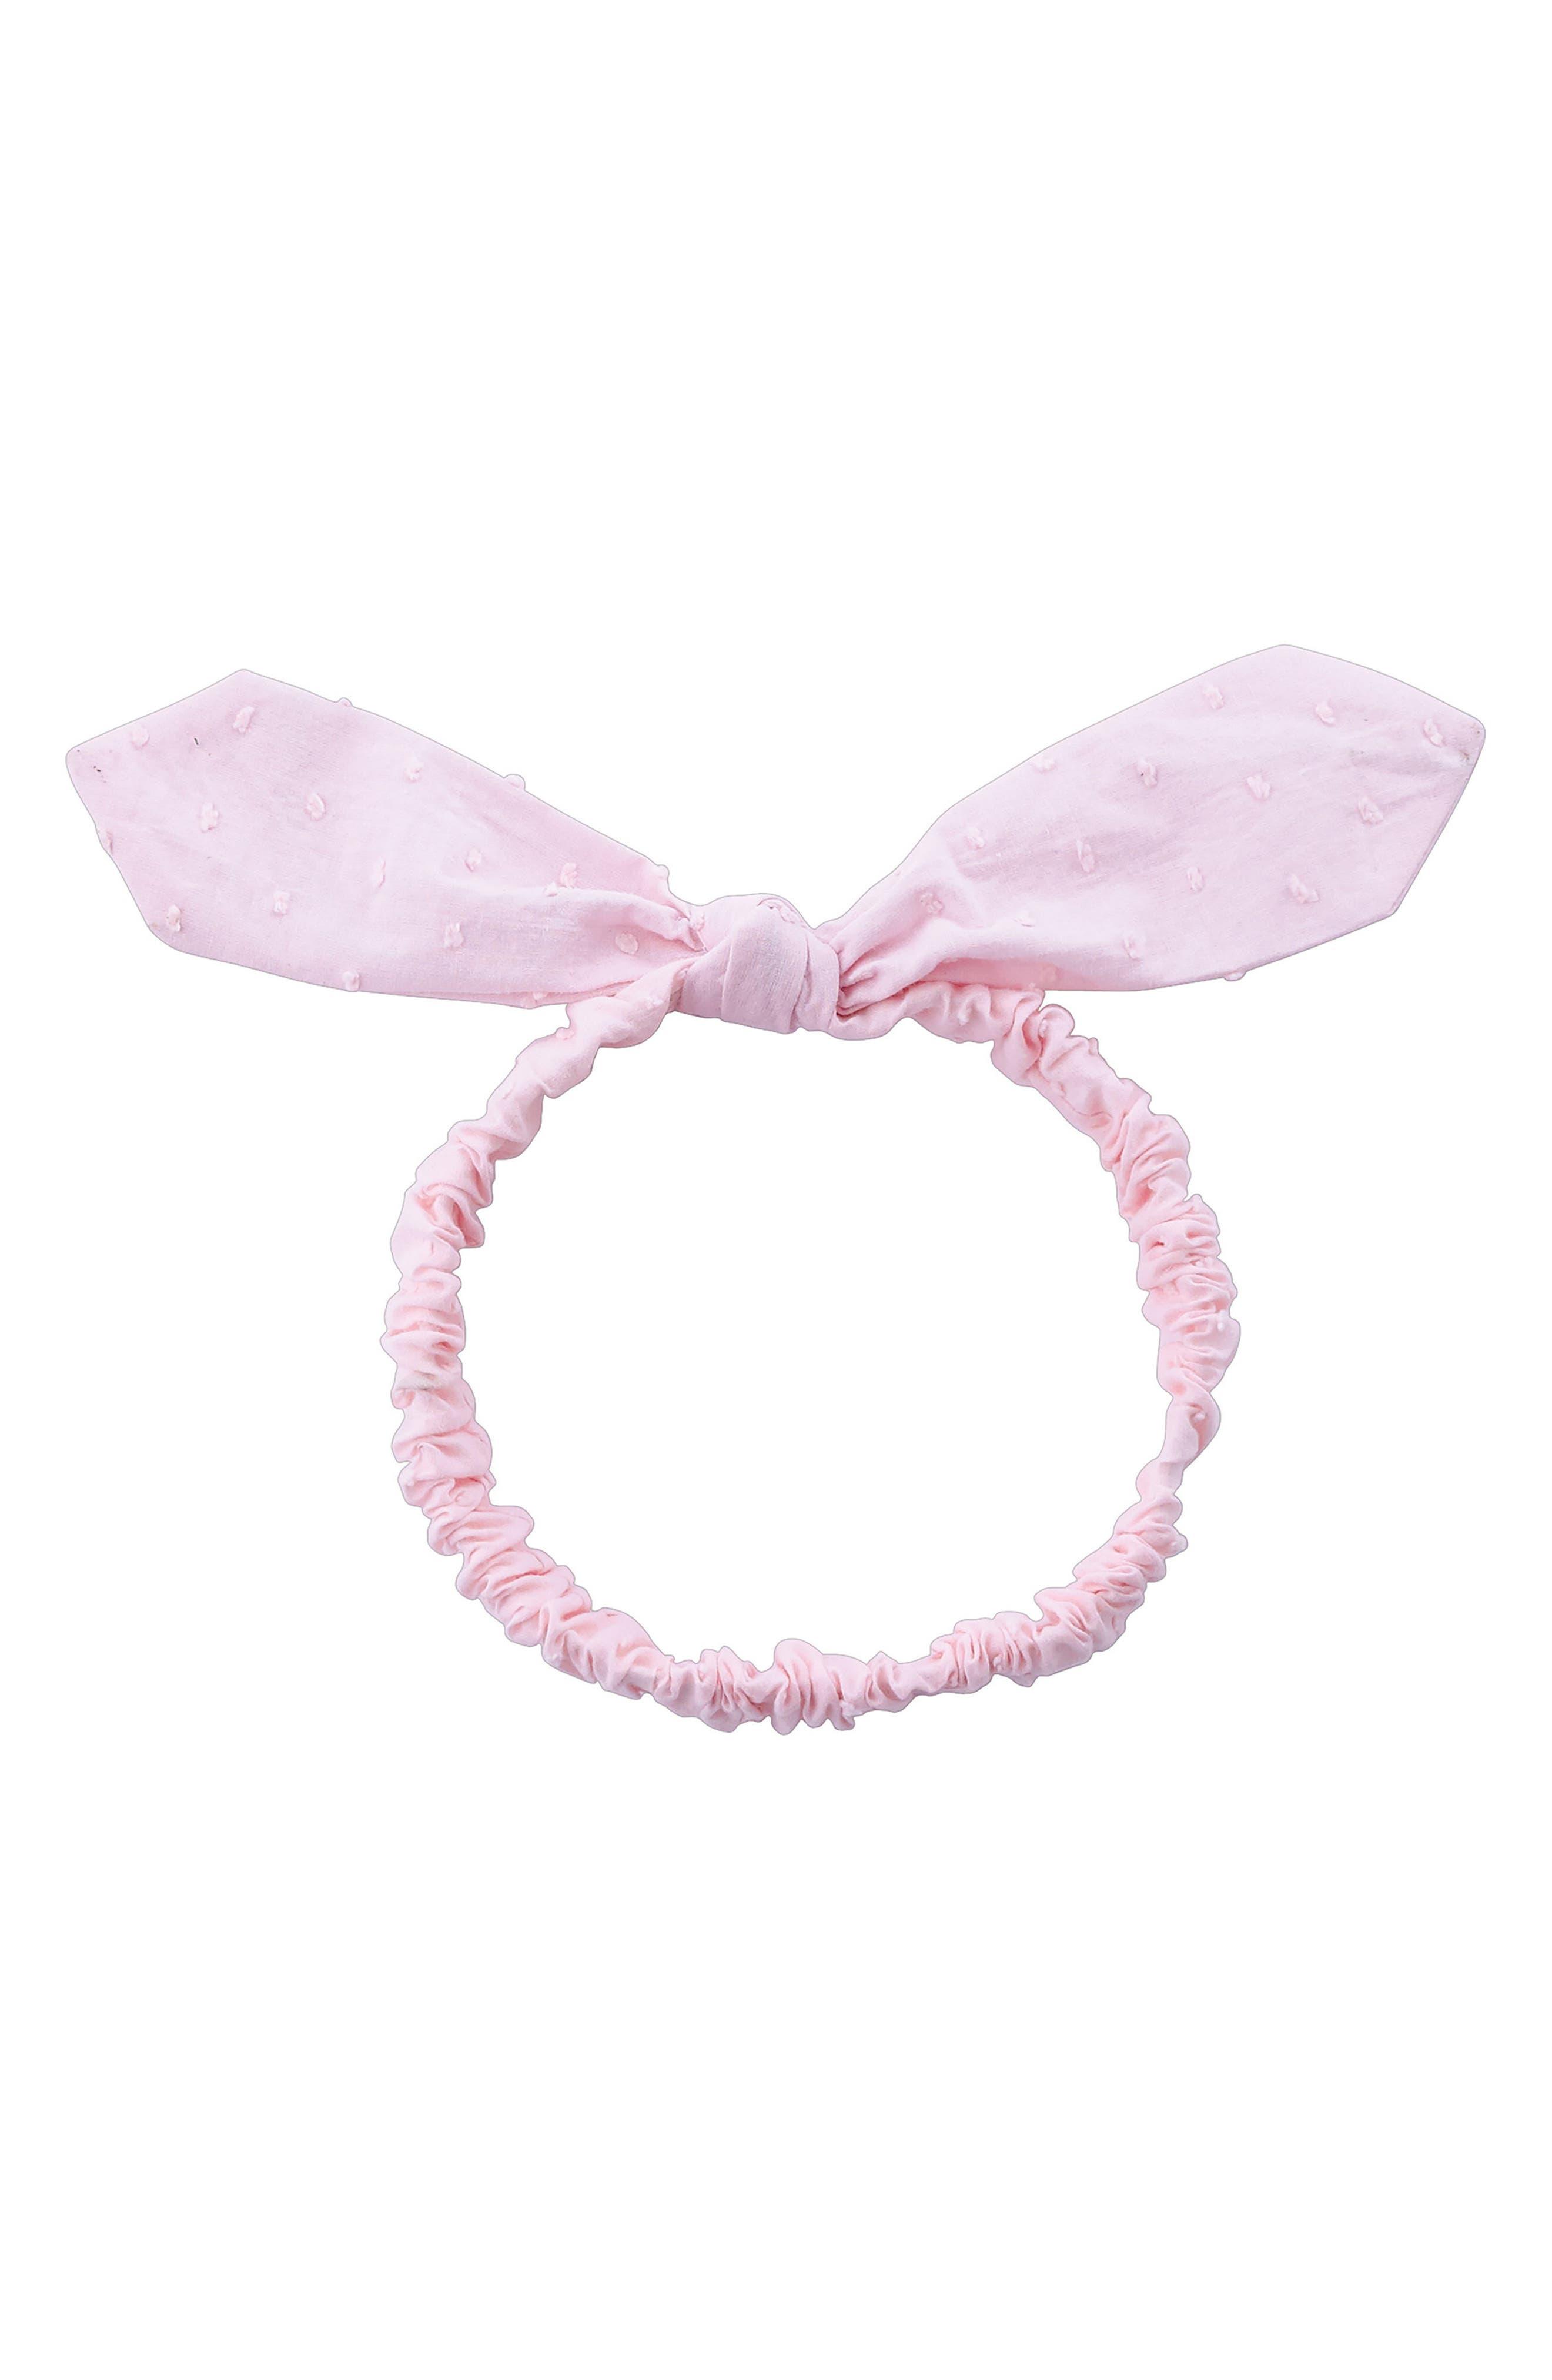 Bunny Ears Headband,                         Main,                         color, Pink